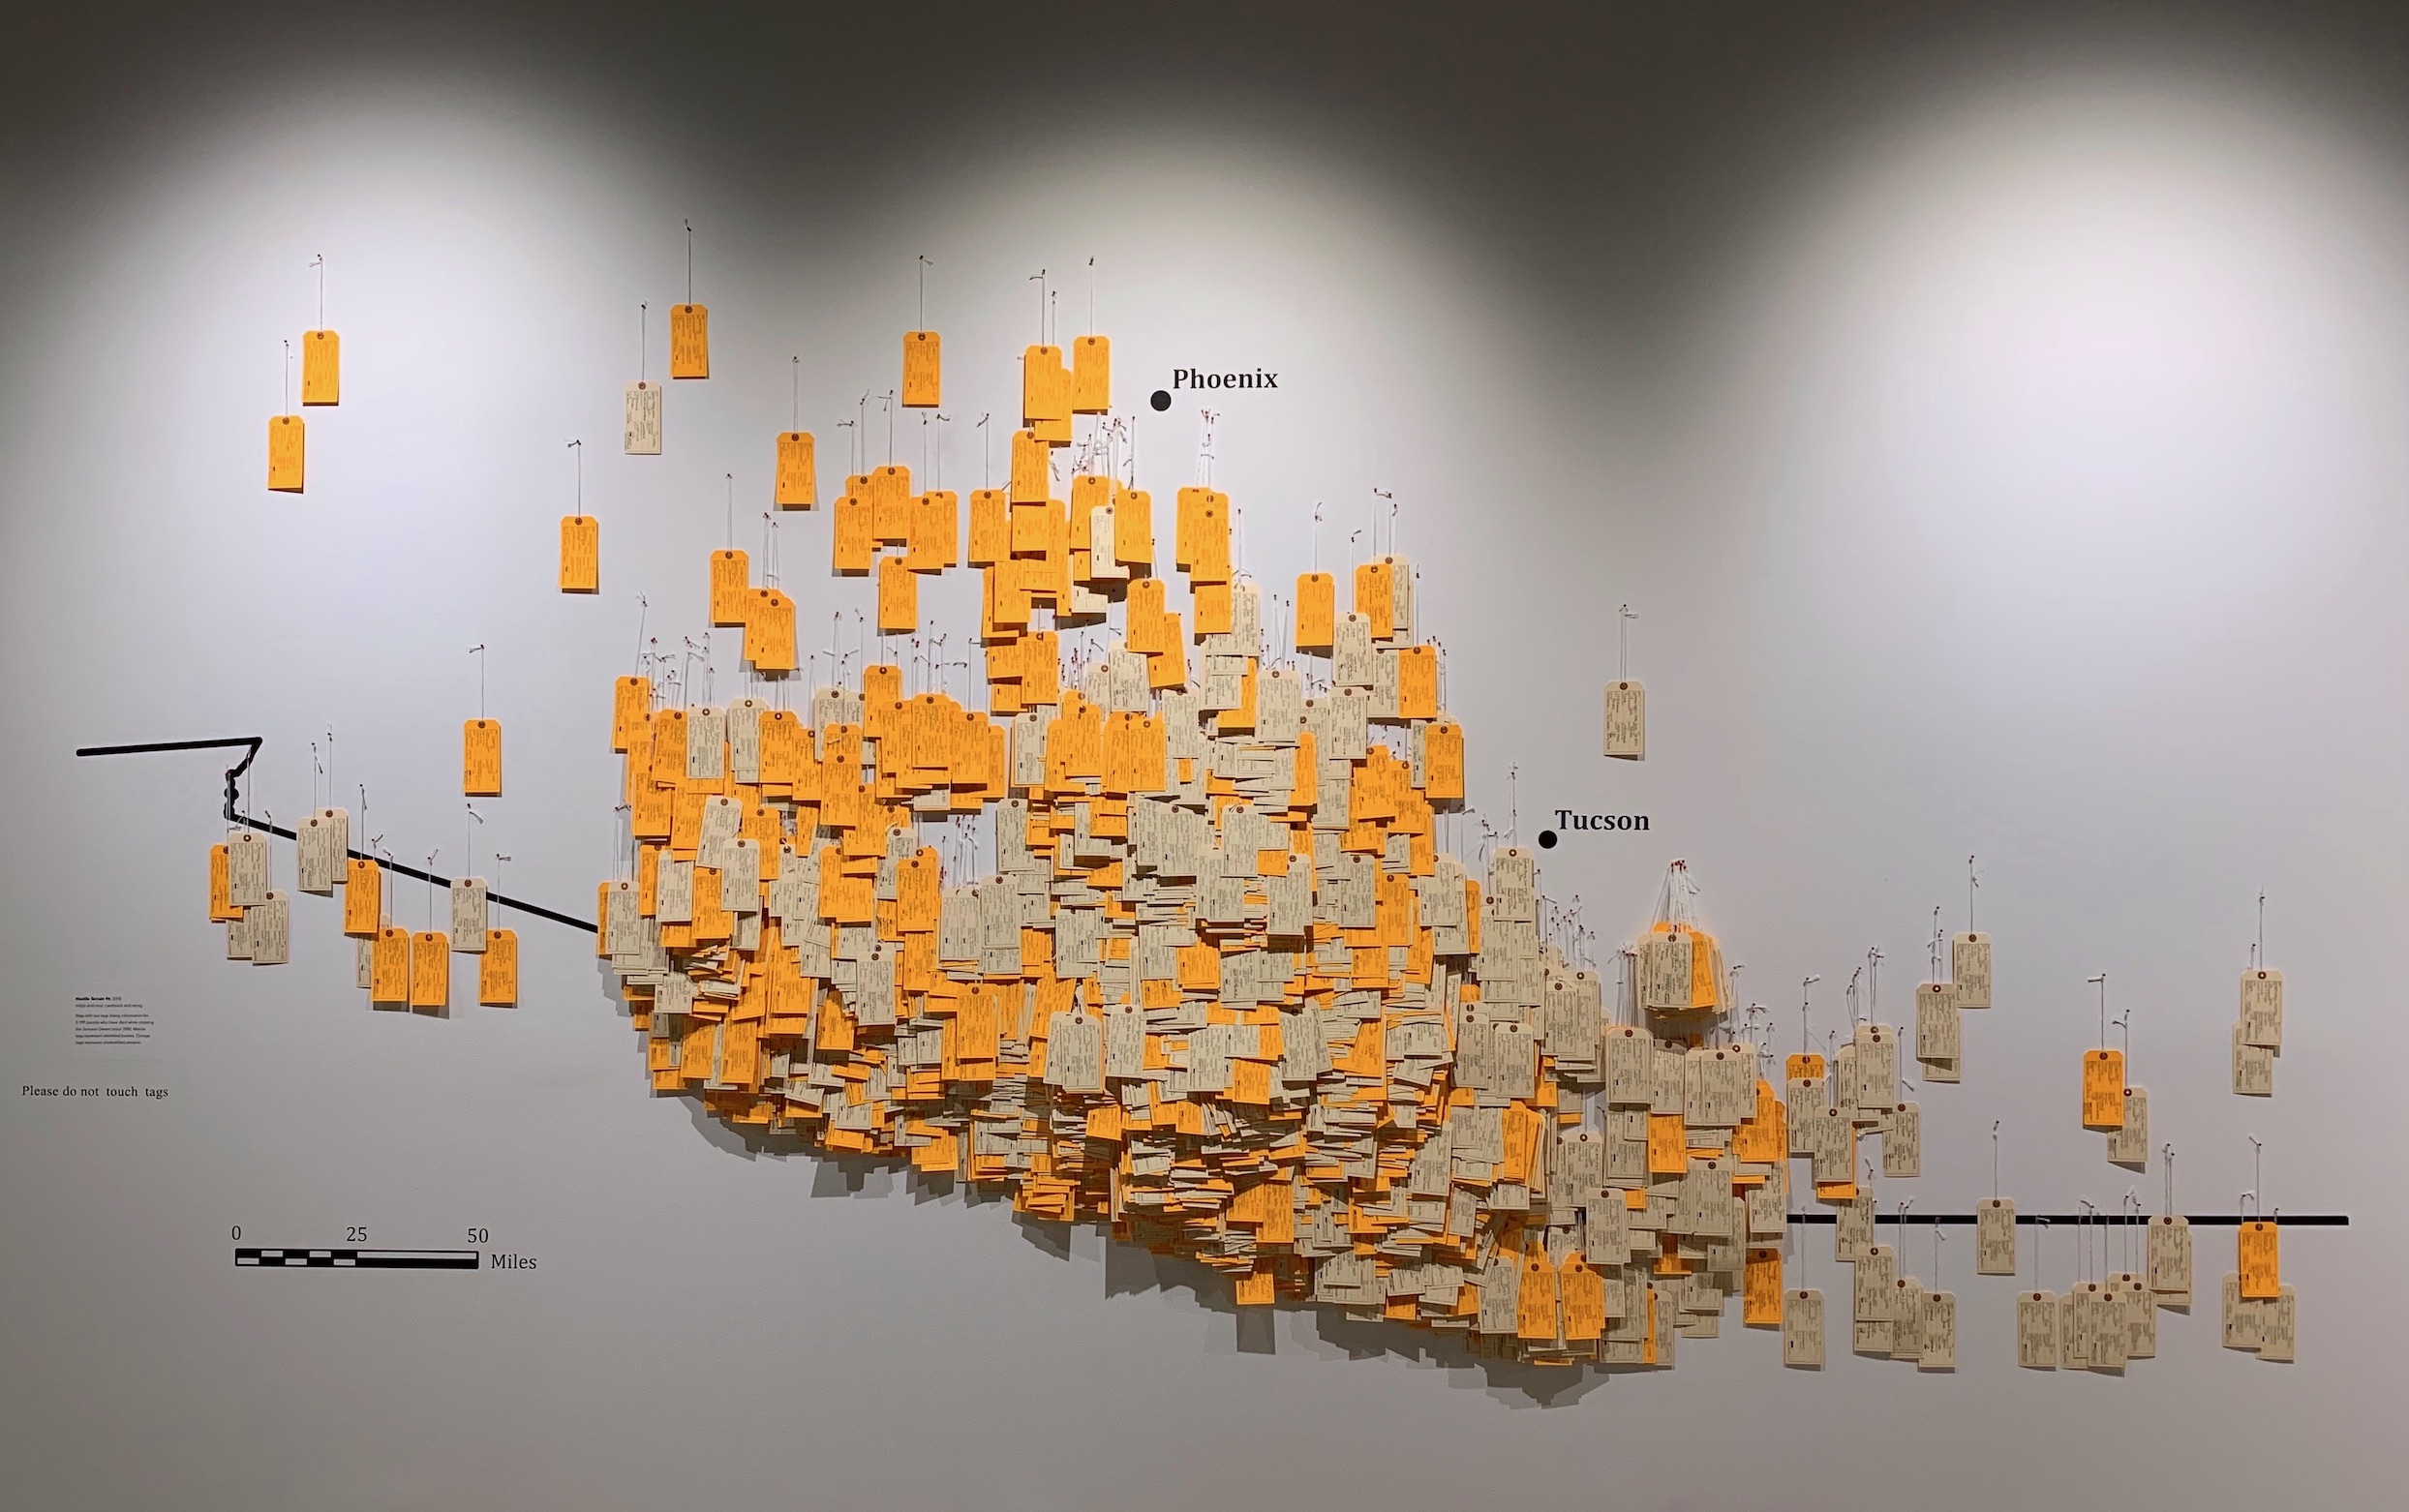 Photograph of installation art